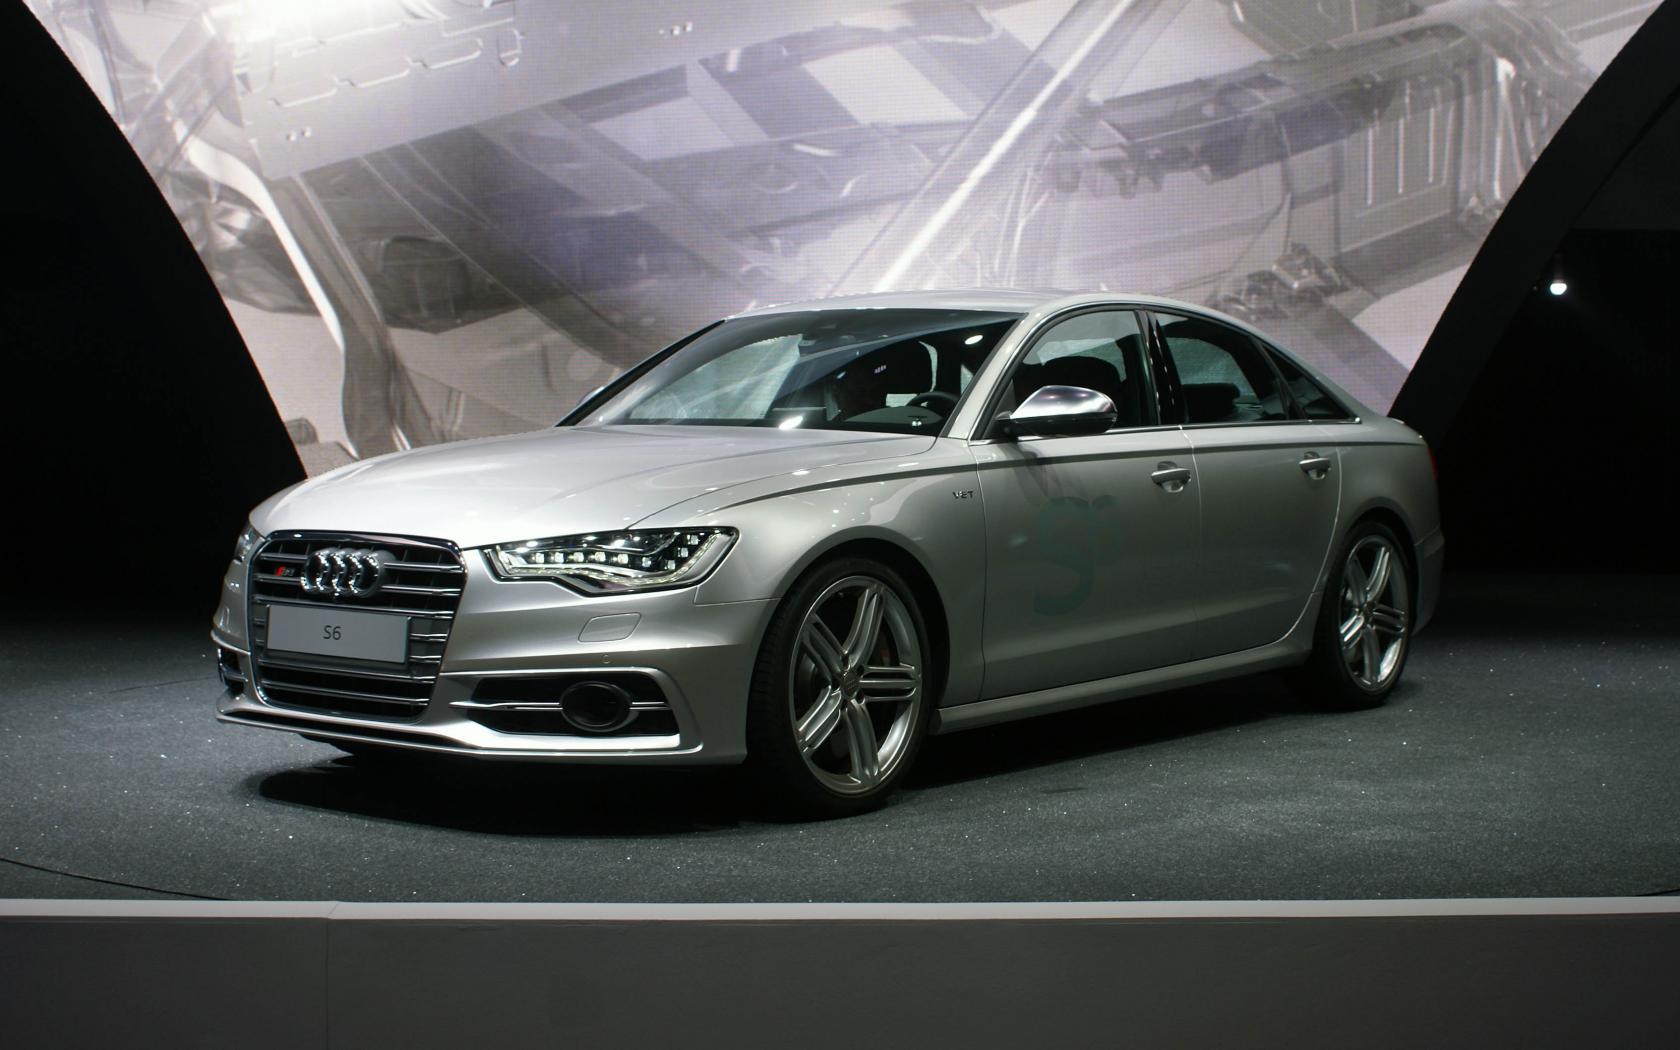 Audi-S6-C7-4